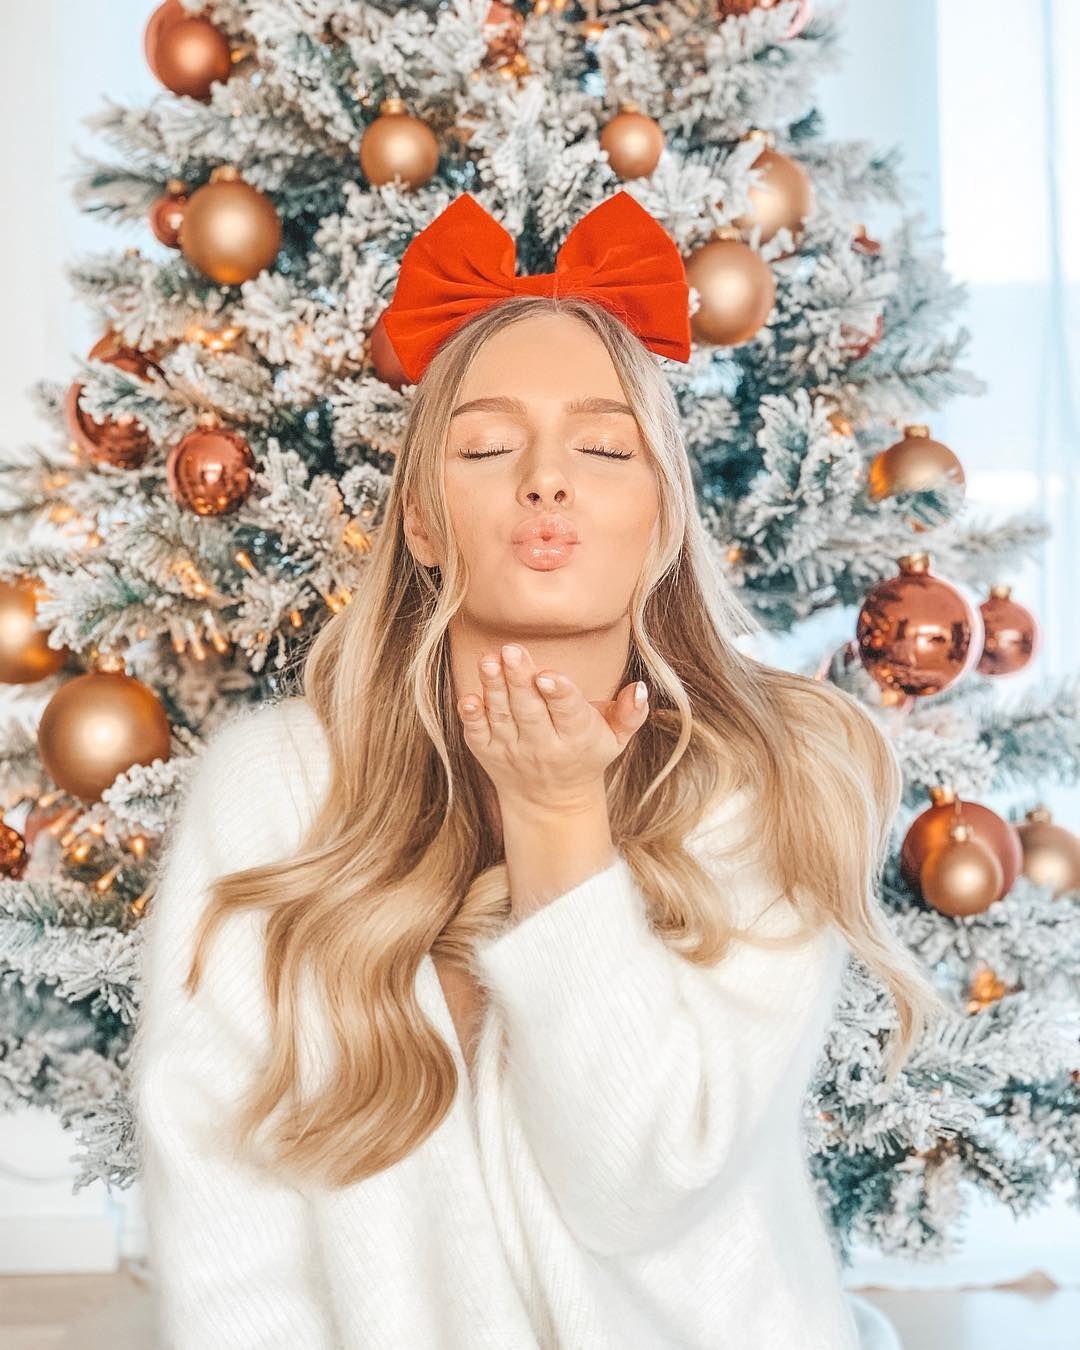 "CELINA MARIE on Instagram: ""HAPPY SUNDAY ️�️ #christmastree #christmasmood #christmas #blondesandcookies #prettylittleiiinspo"""